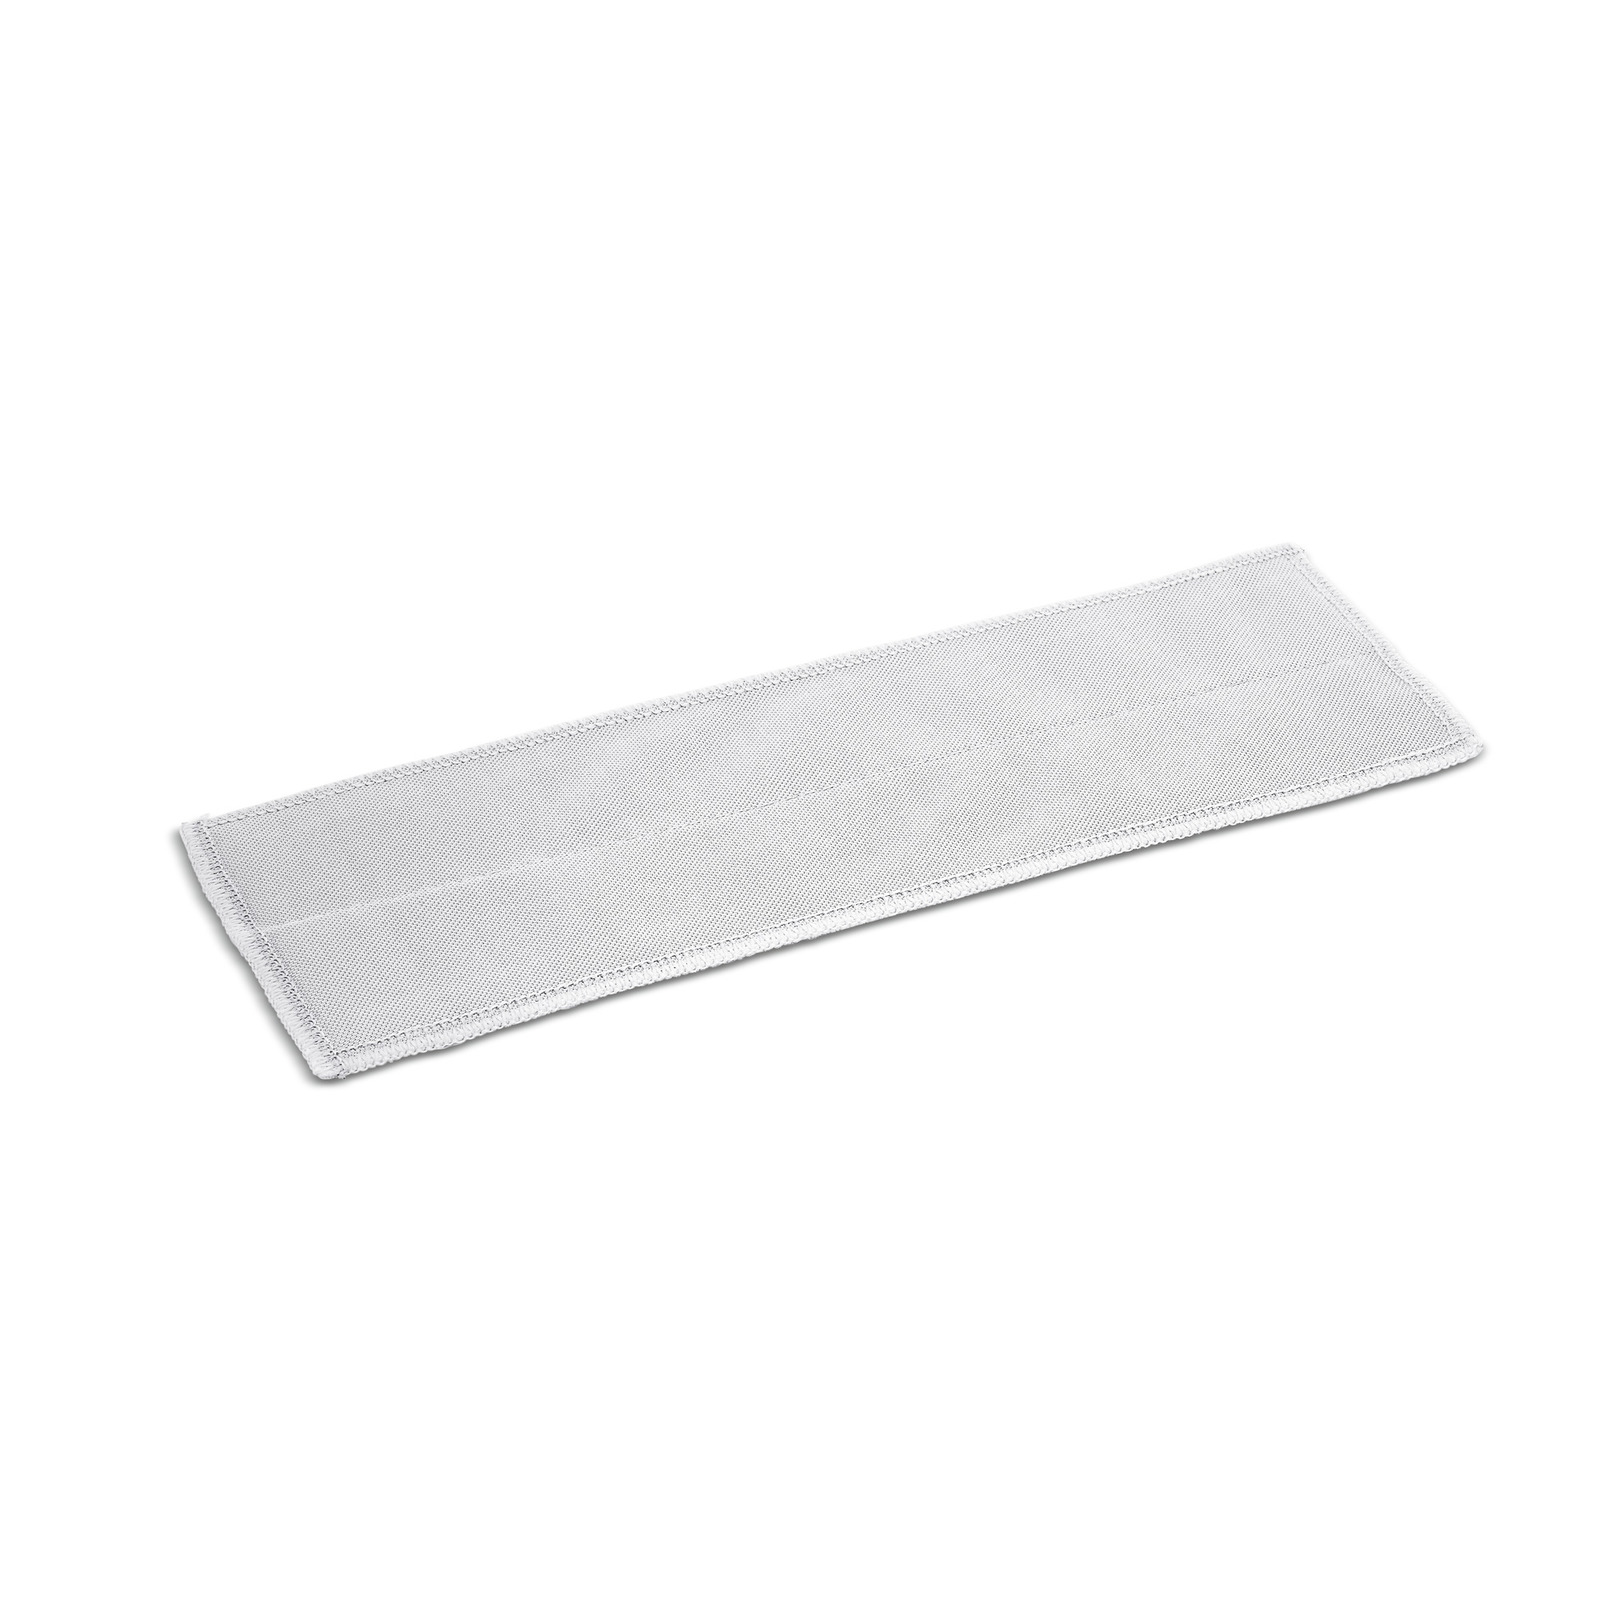 mikrofaserbezug f r handpadhalter glas 30cm k rcher. Black Bedroom Furniture Sets. Home Design Ideas